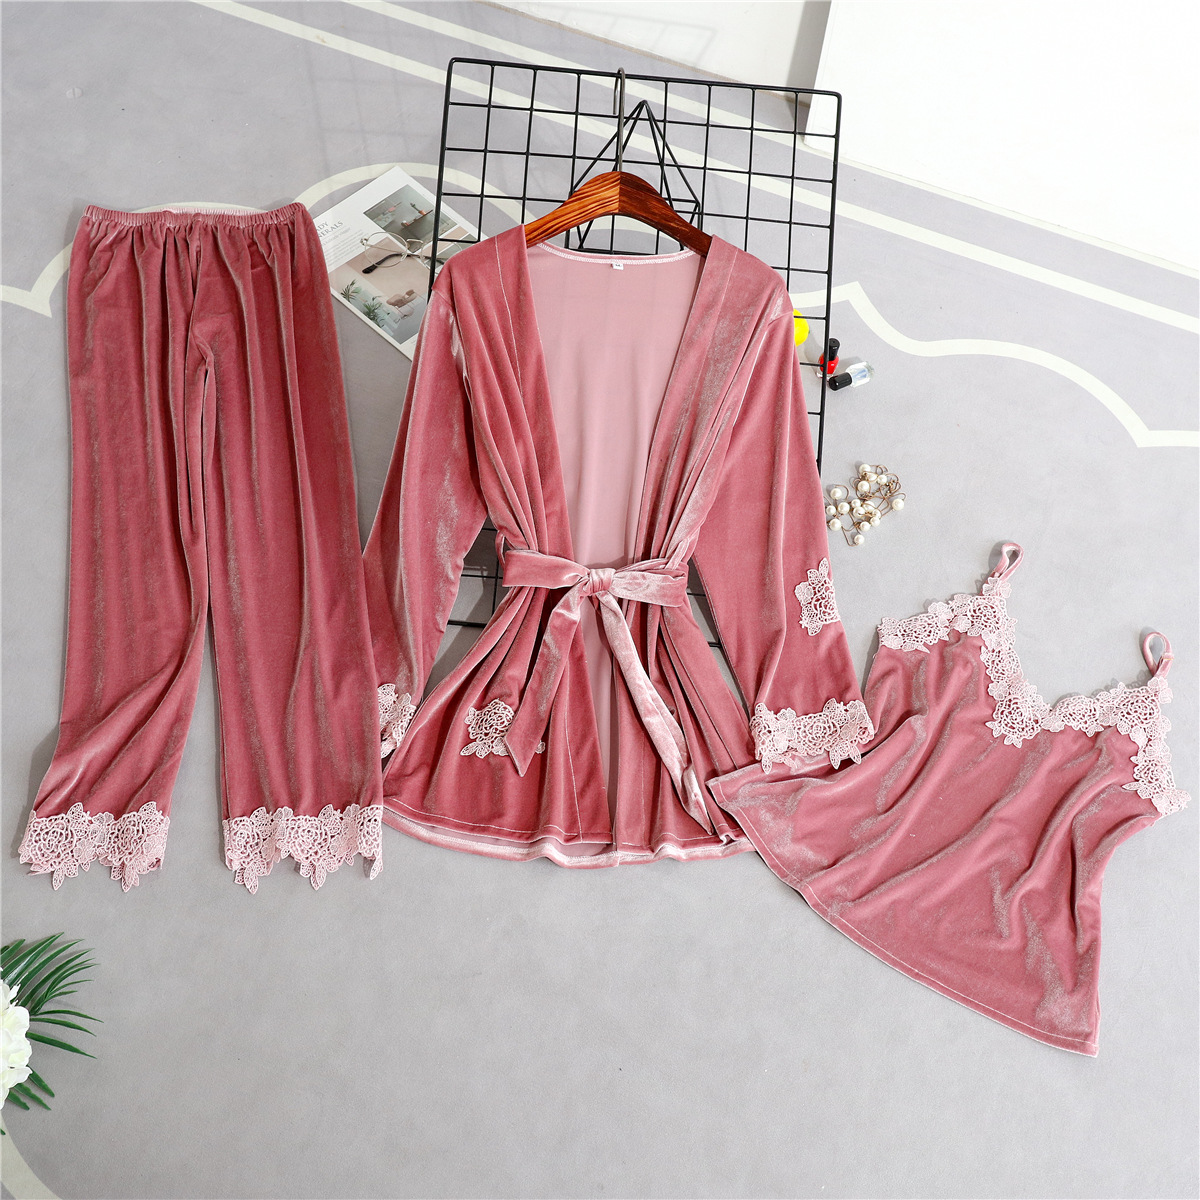 026be33991 New Women Velvet 3 Pieces Sleepwear Autumn Winter Warm Cami Pants Robe Home  Wear Floral Trim Pajama Pijama Set Thick Nightwear